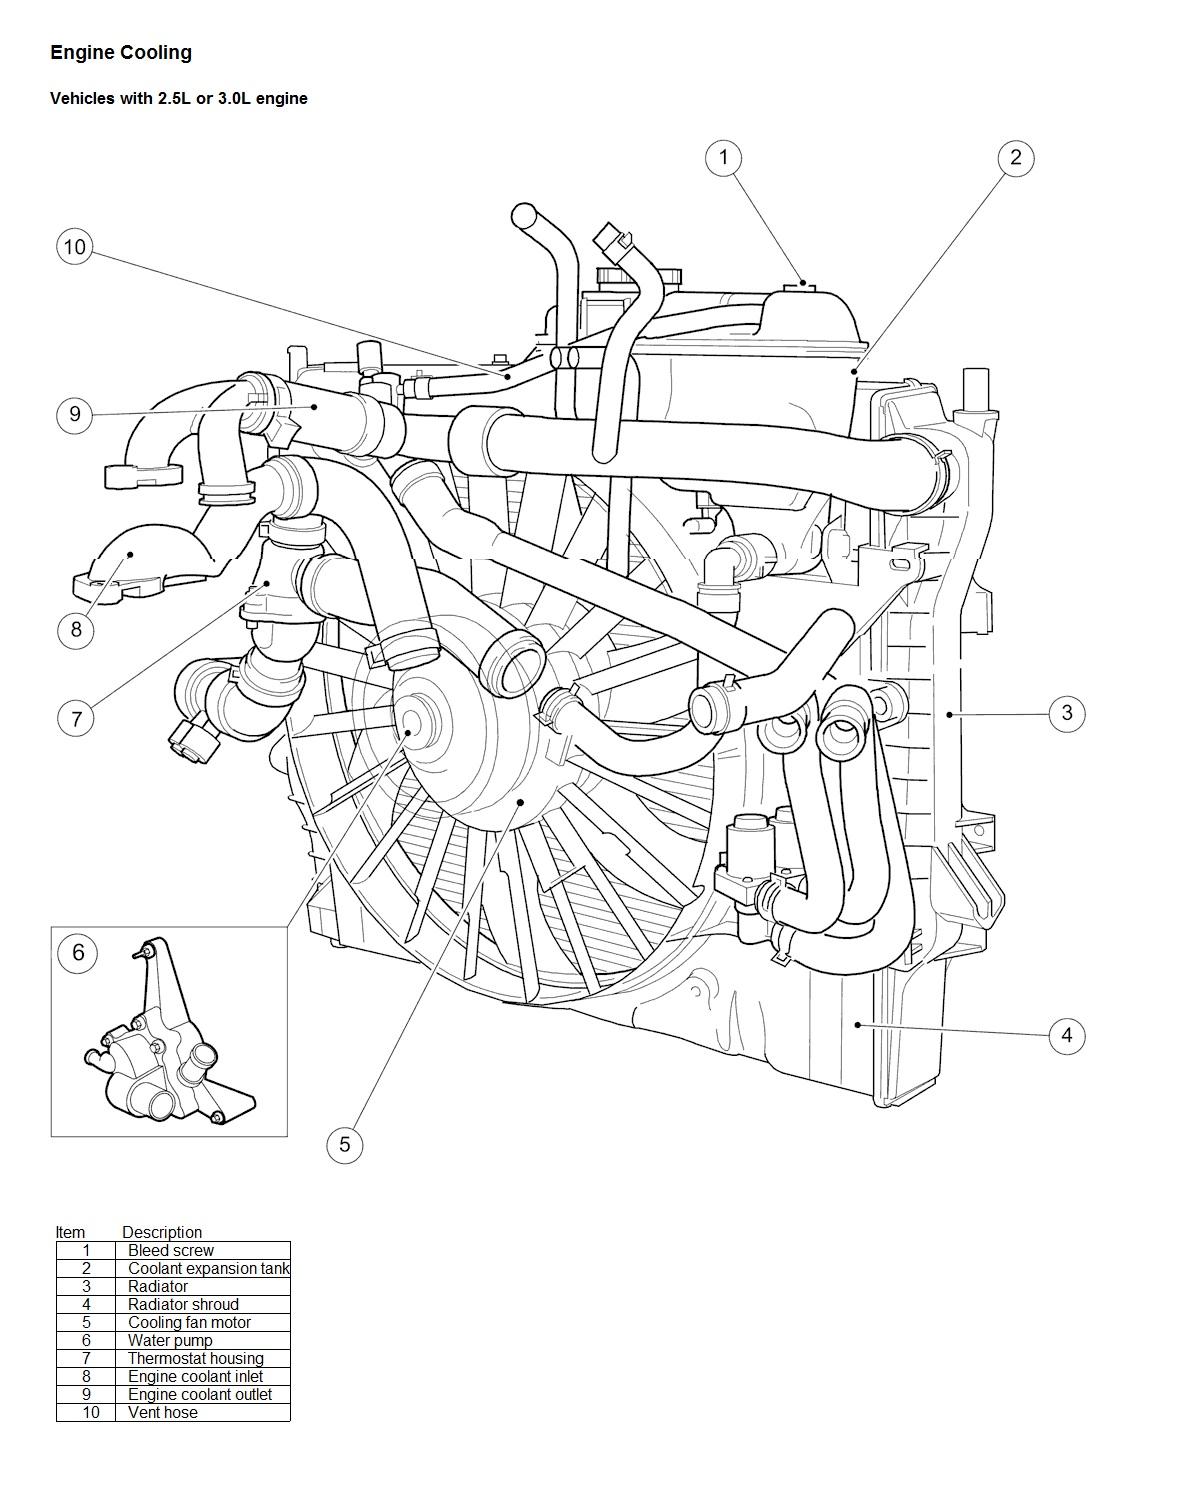 Jaguar Aj16 Engine Diagrams